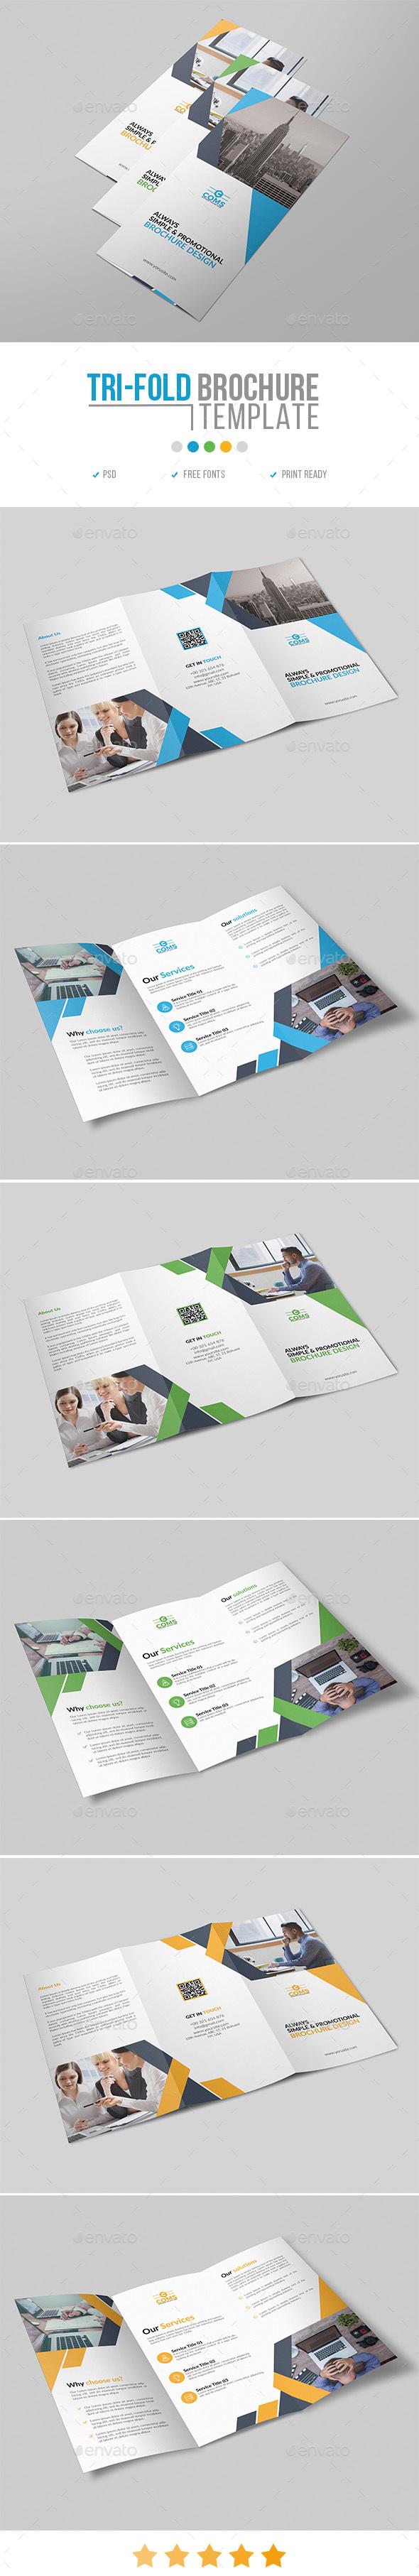 Trifold Brochure Template 28 - Corporate Brochures